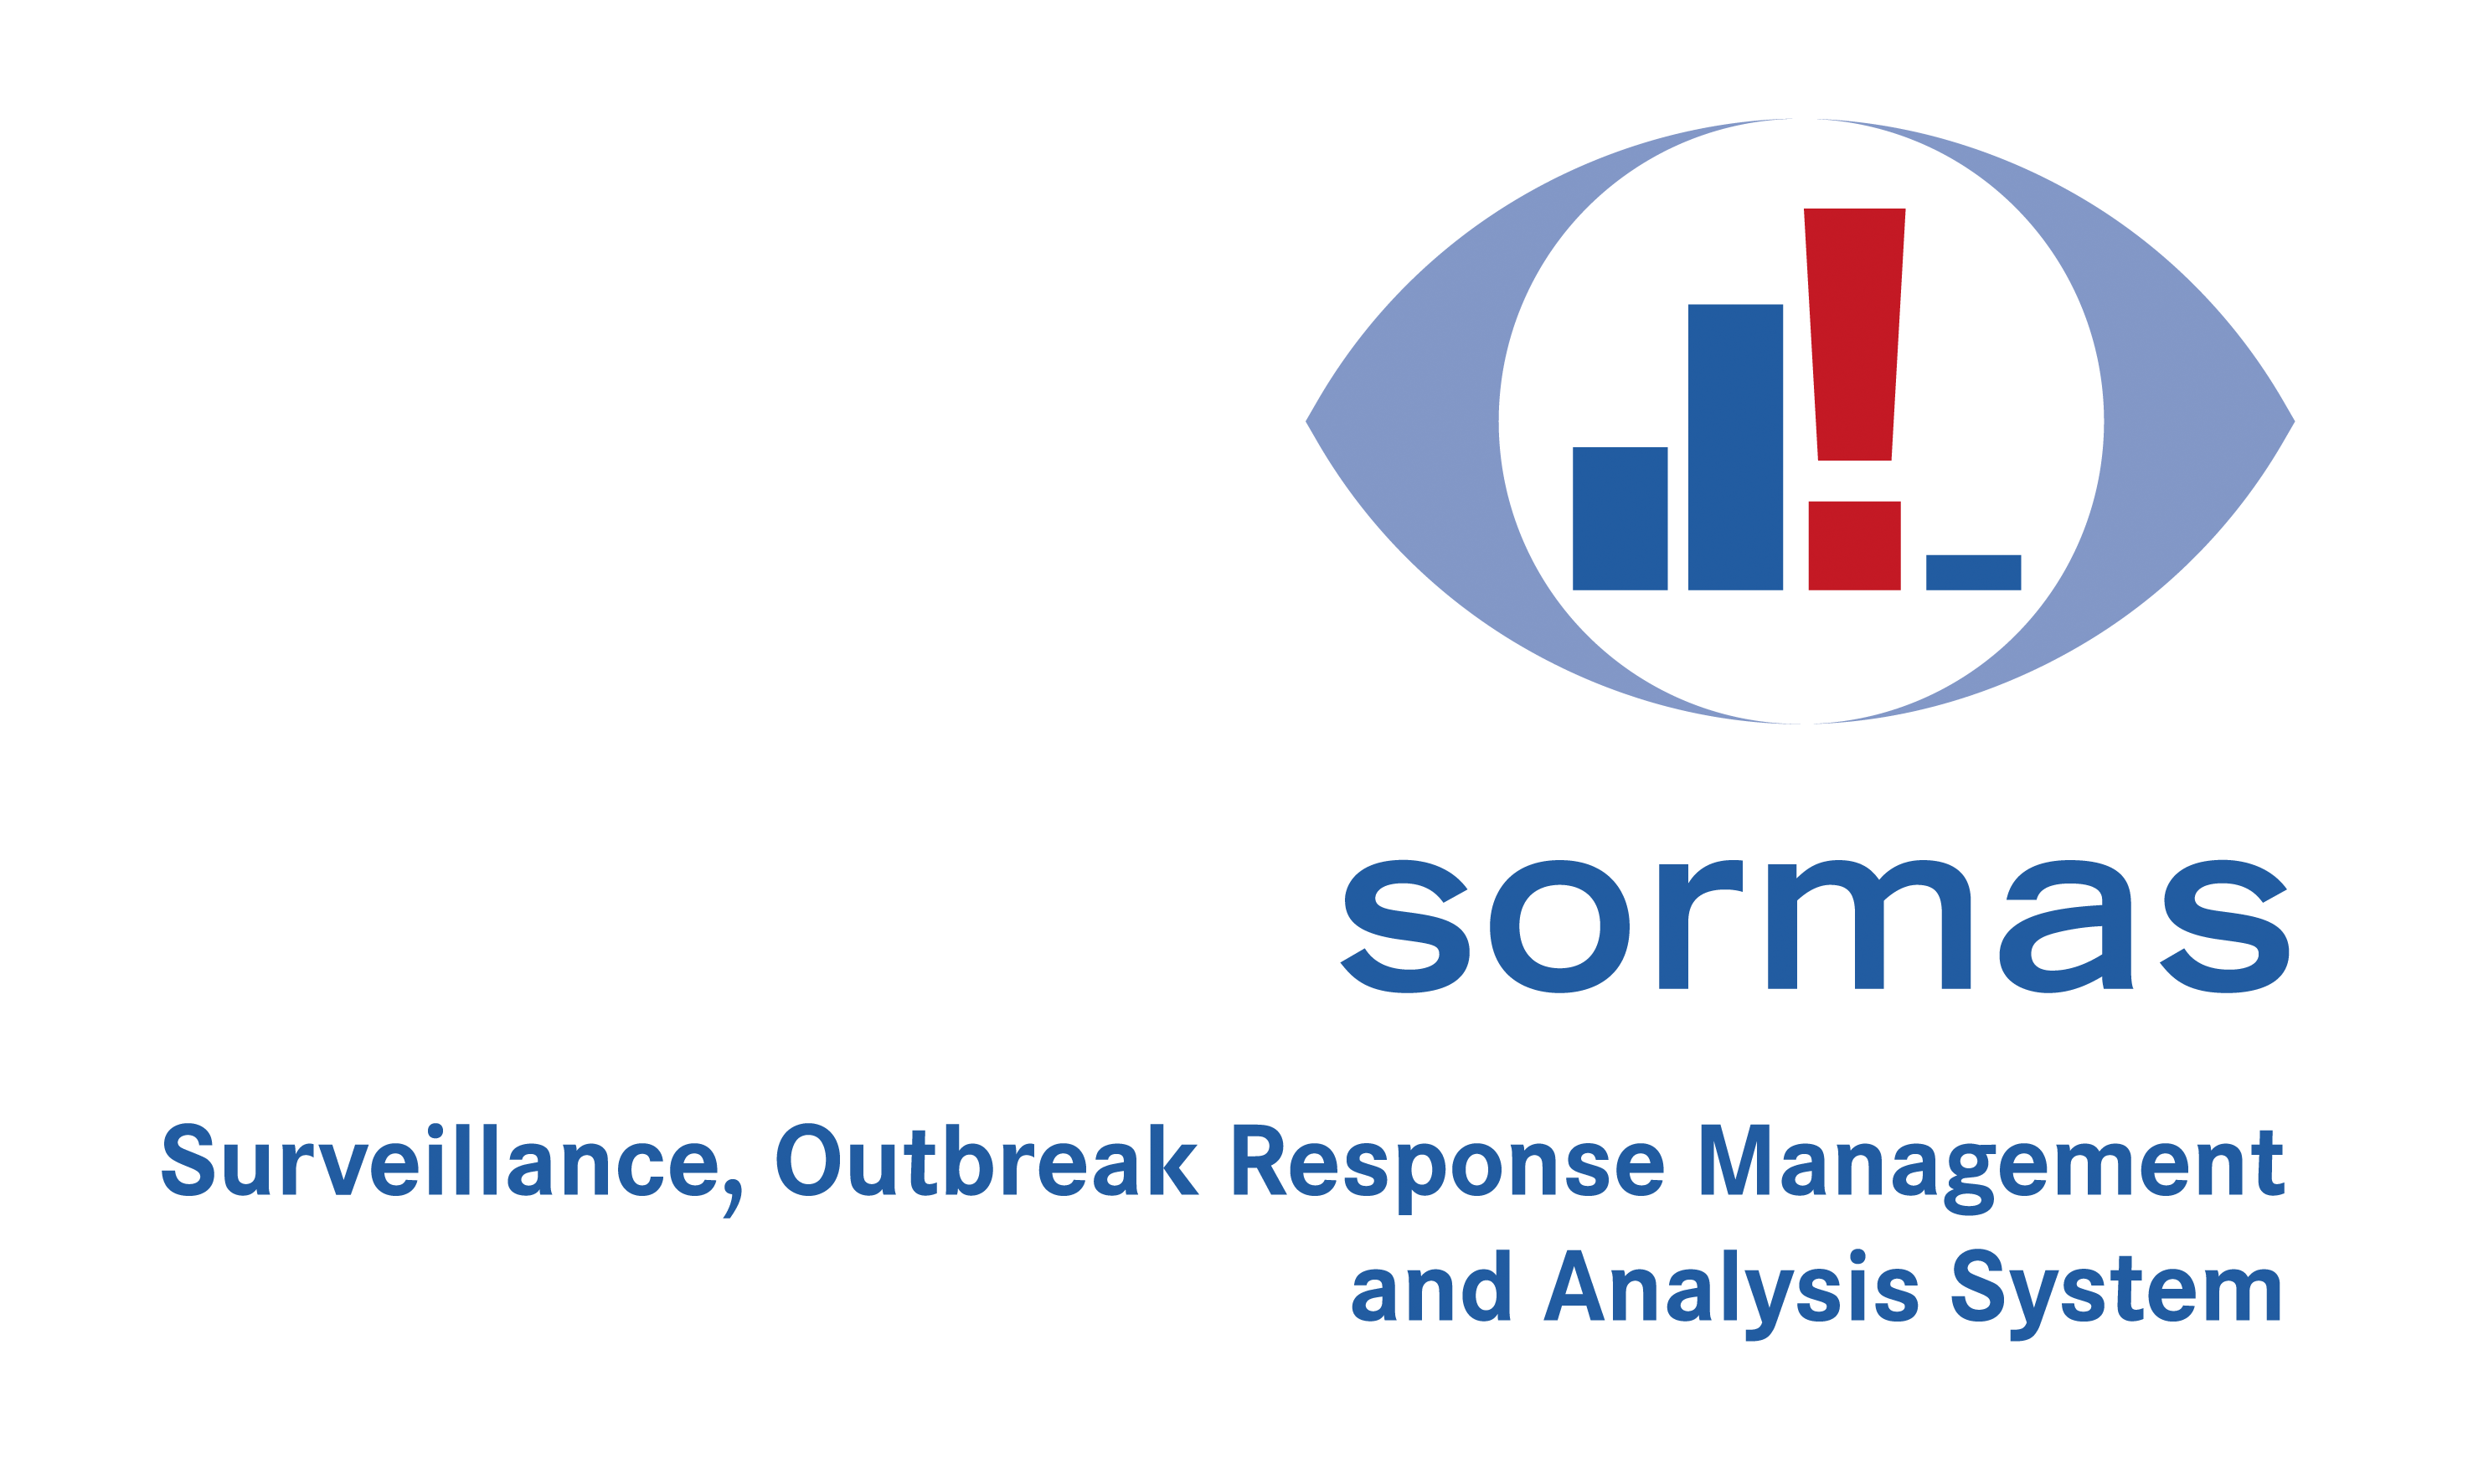 Project Management for Surveillance Outbreak Response Management & Analysis System (SORMAS), HZI